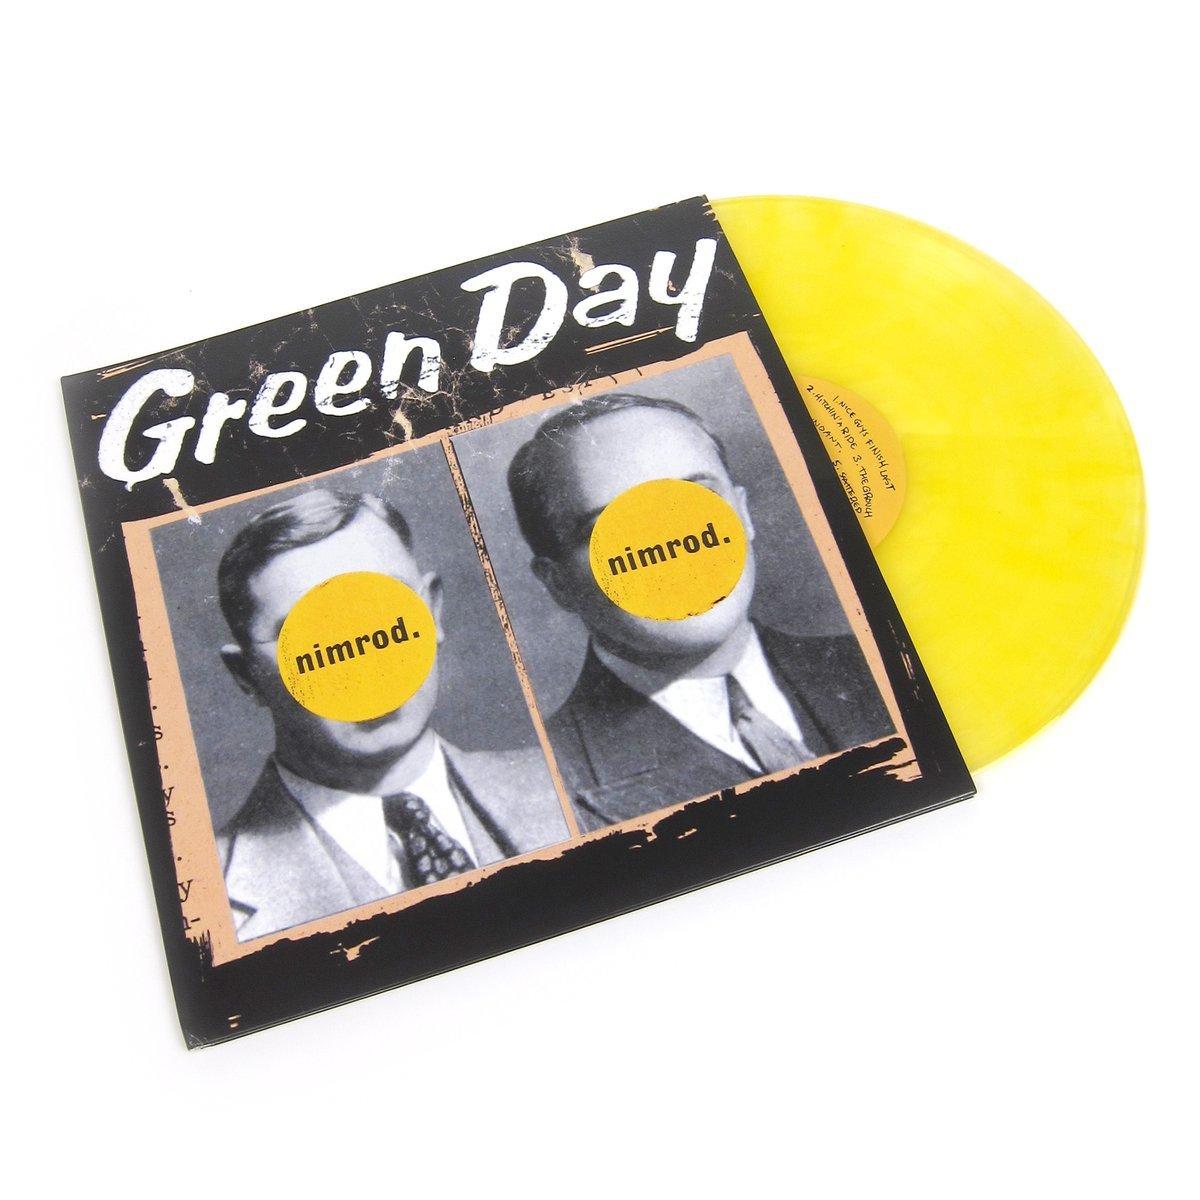 Greenday Nimrod 20th anniversary lp 3